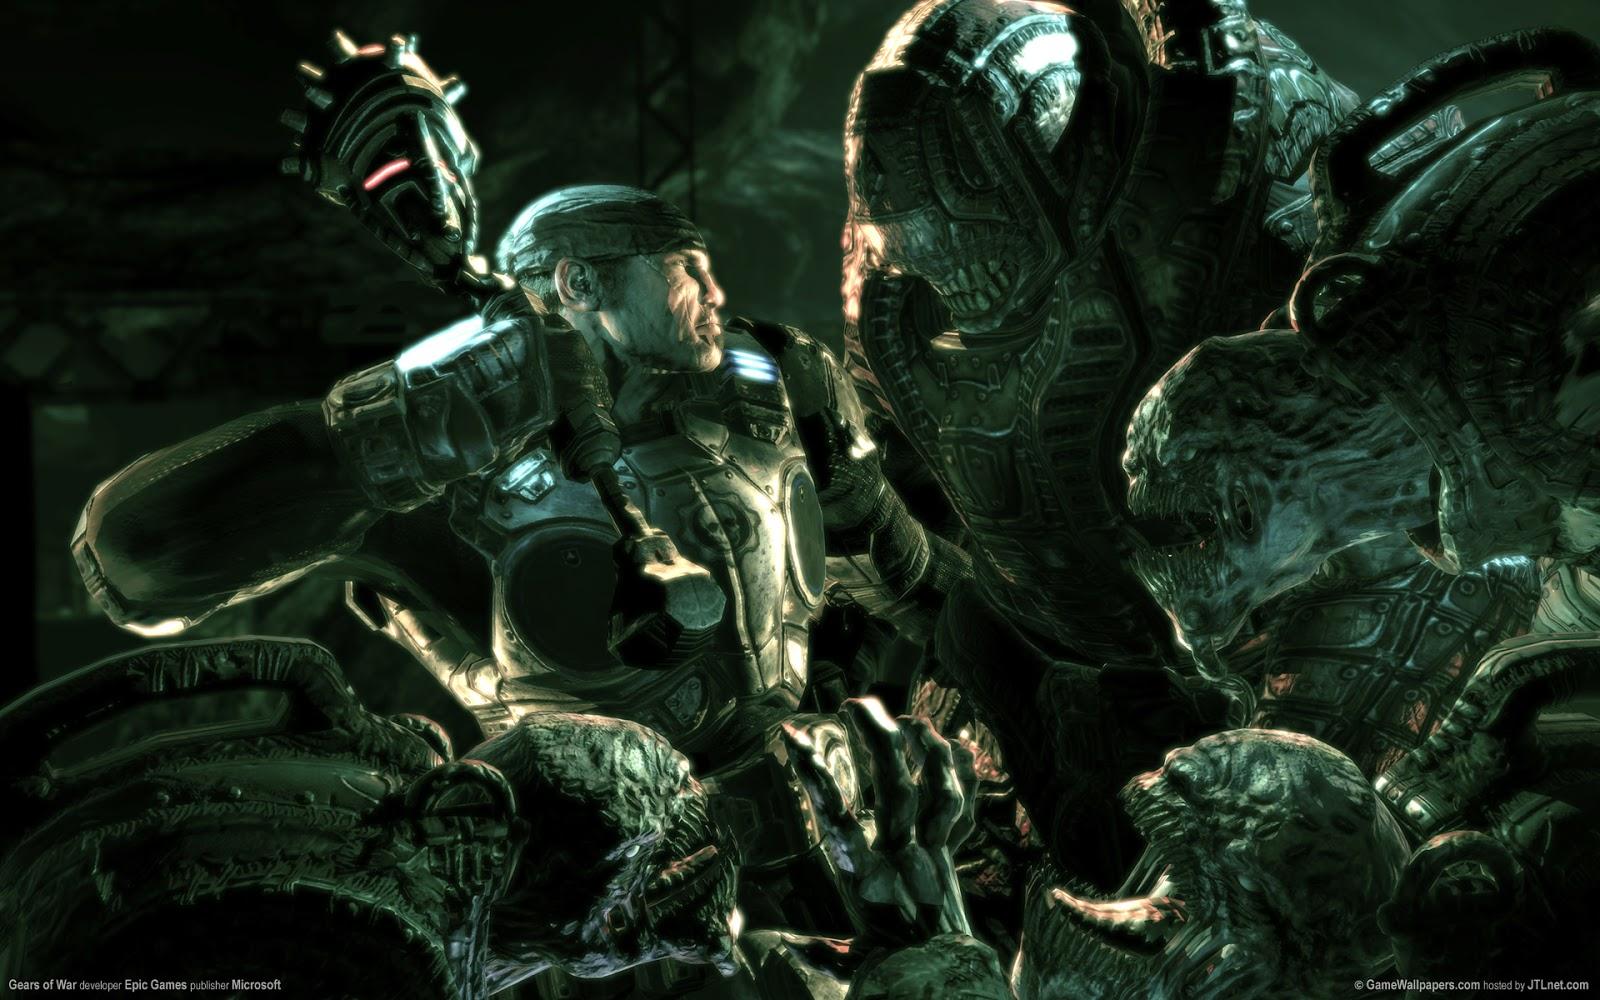 http://2.bp.blogspot.com/-RpoLgaan5FQ/ULr6fSqbOZI/AAAAAAAADJ4/ygxTEFLA0Bk/s1600/wallpaper_gears_of_war_11_1920x1200.jpg